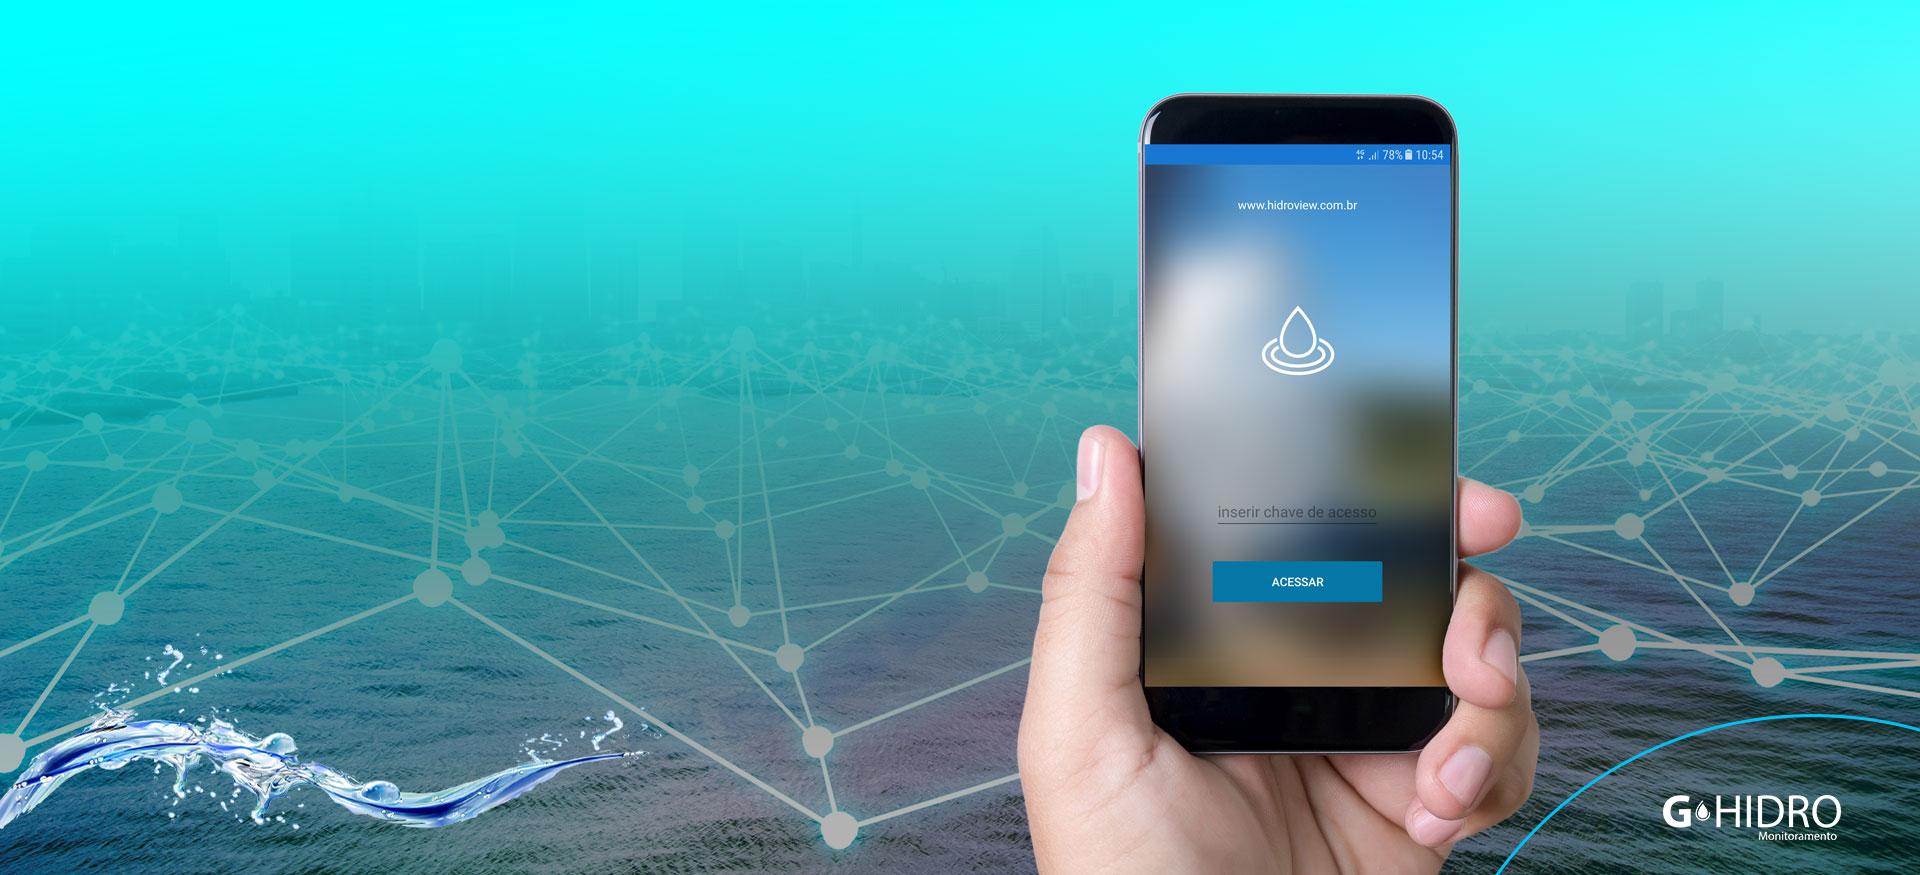 G Hidro - Monitoramento de Água e Energia